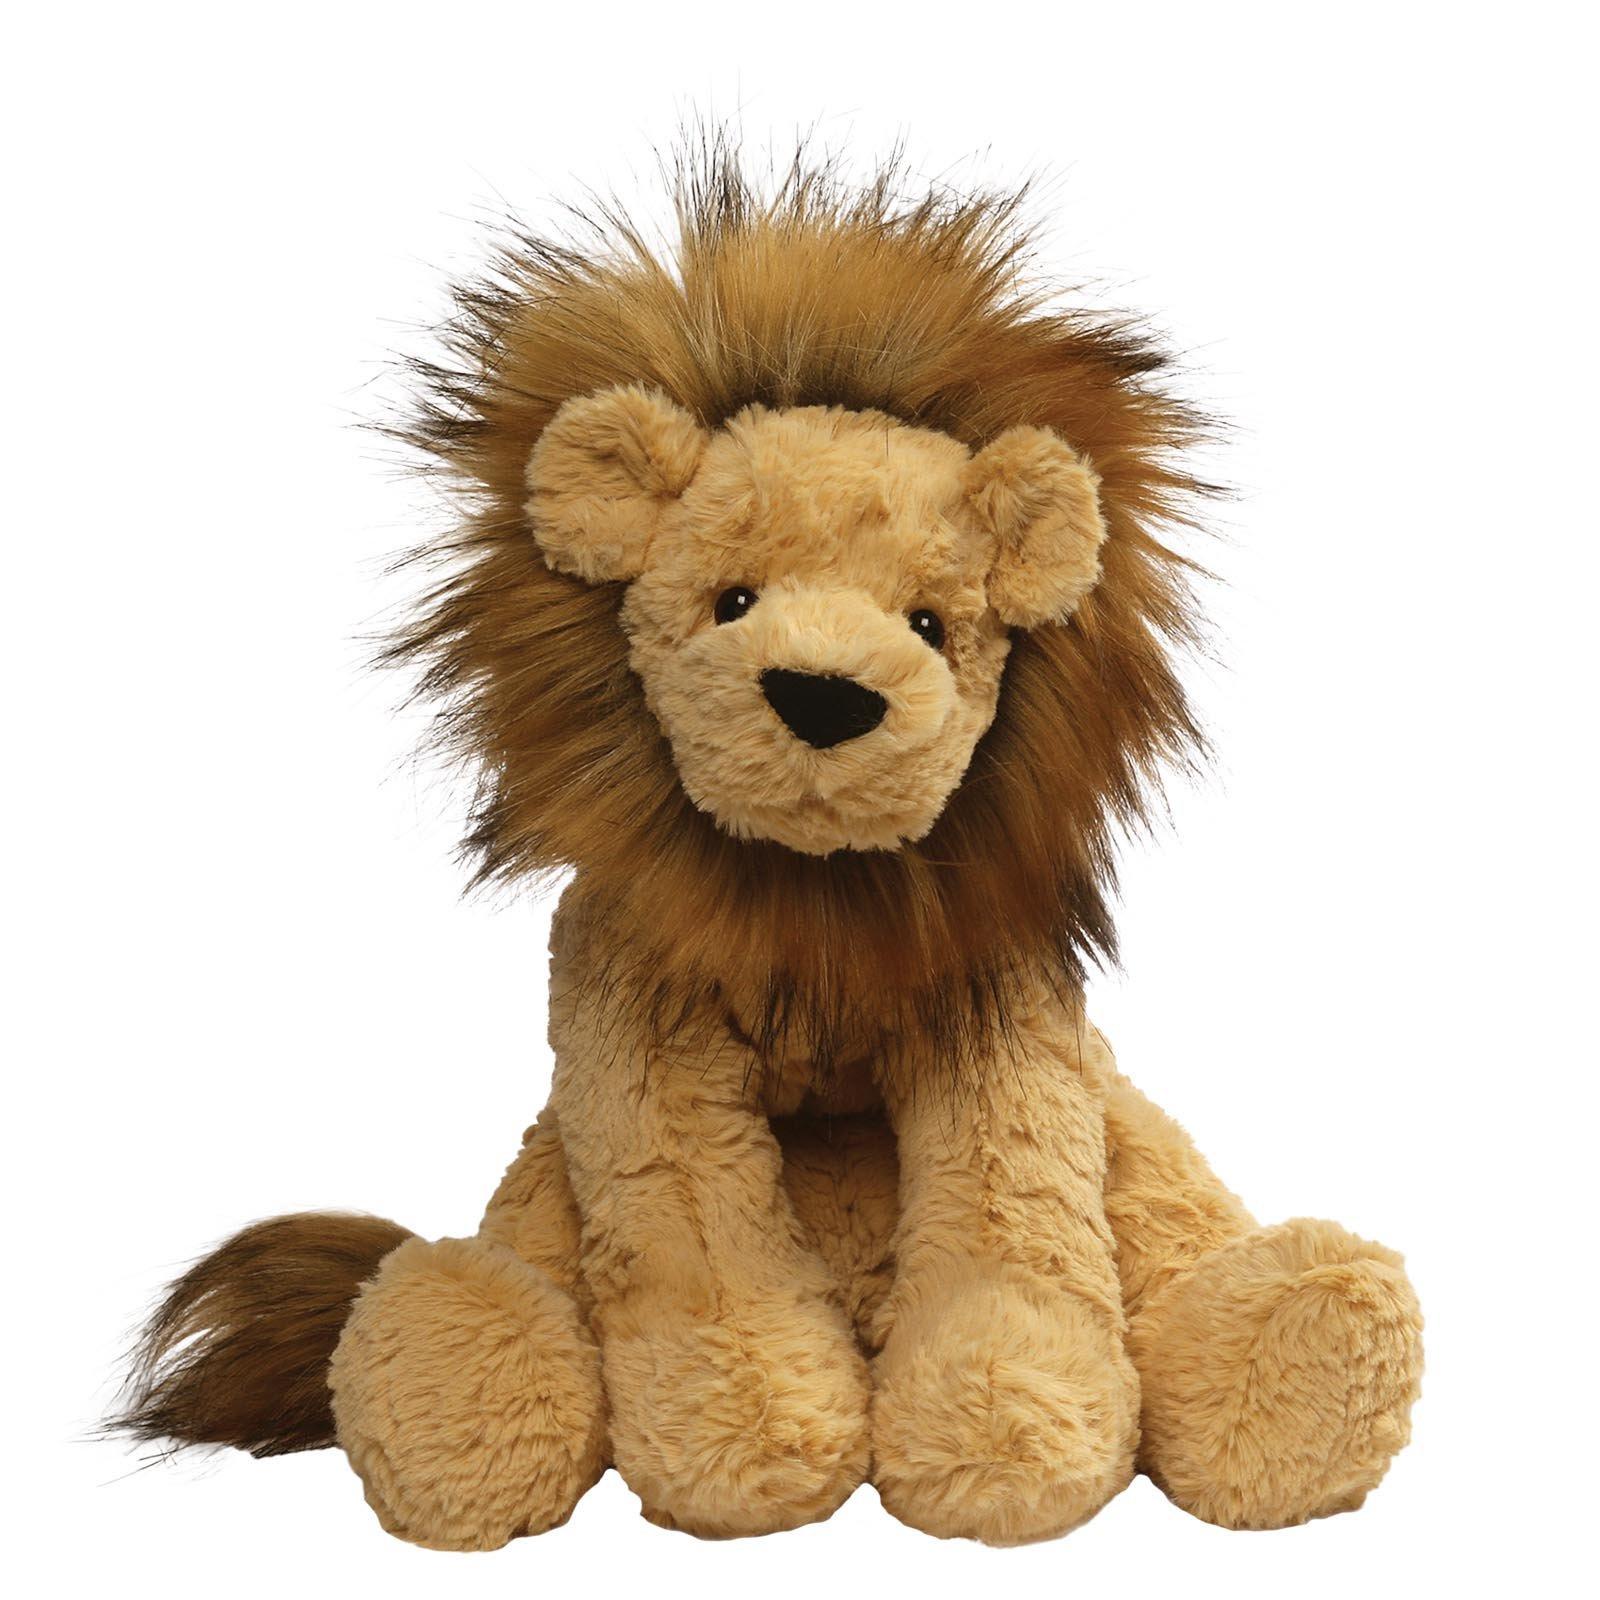 GUND Cozys Collection Lion Stuffed Animal Plush, Tan, 10'' by GUND